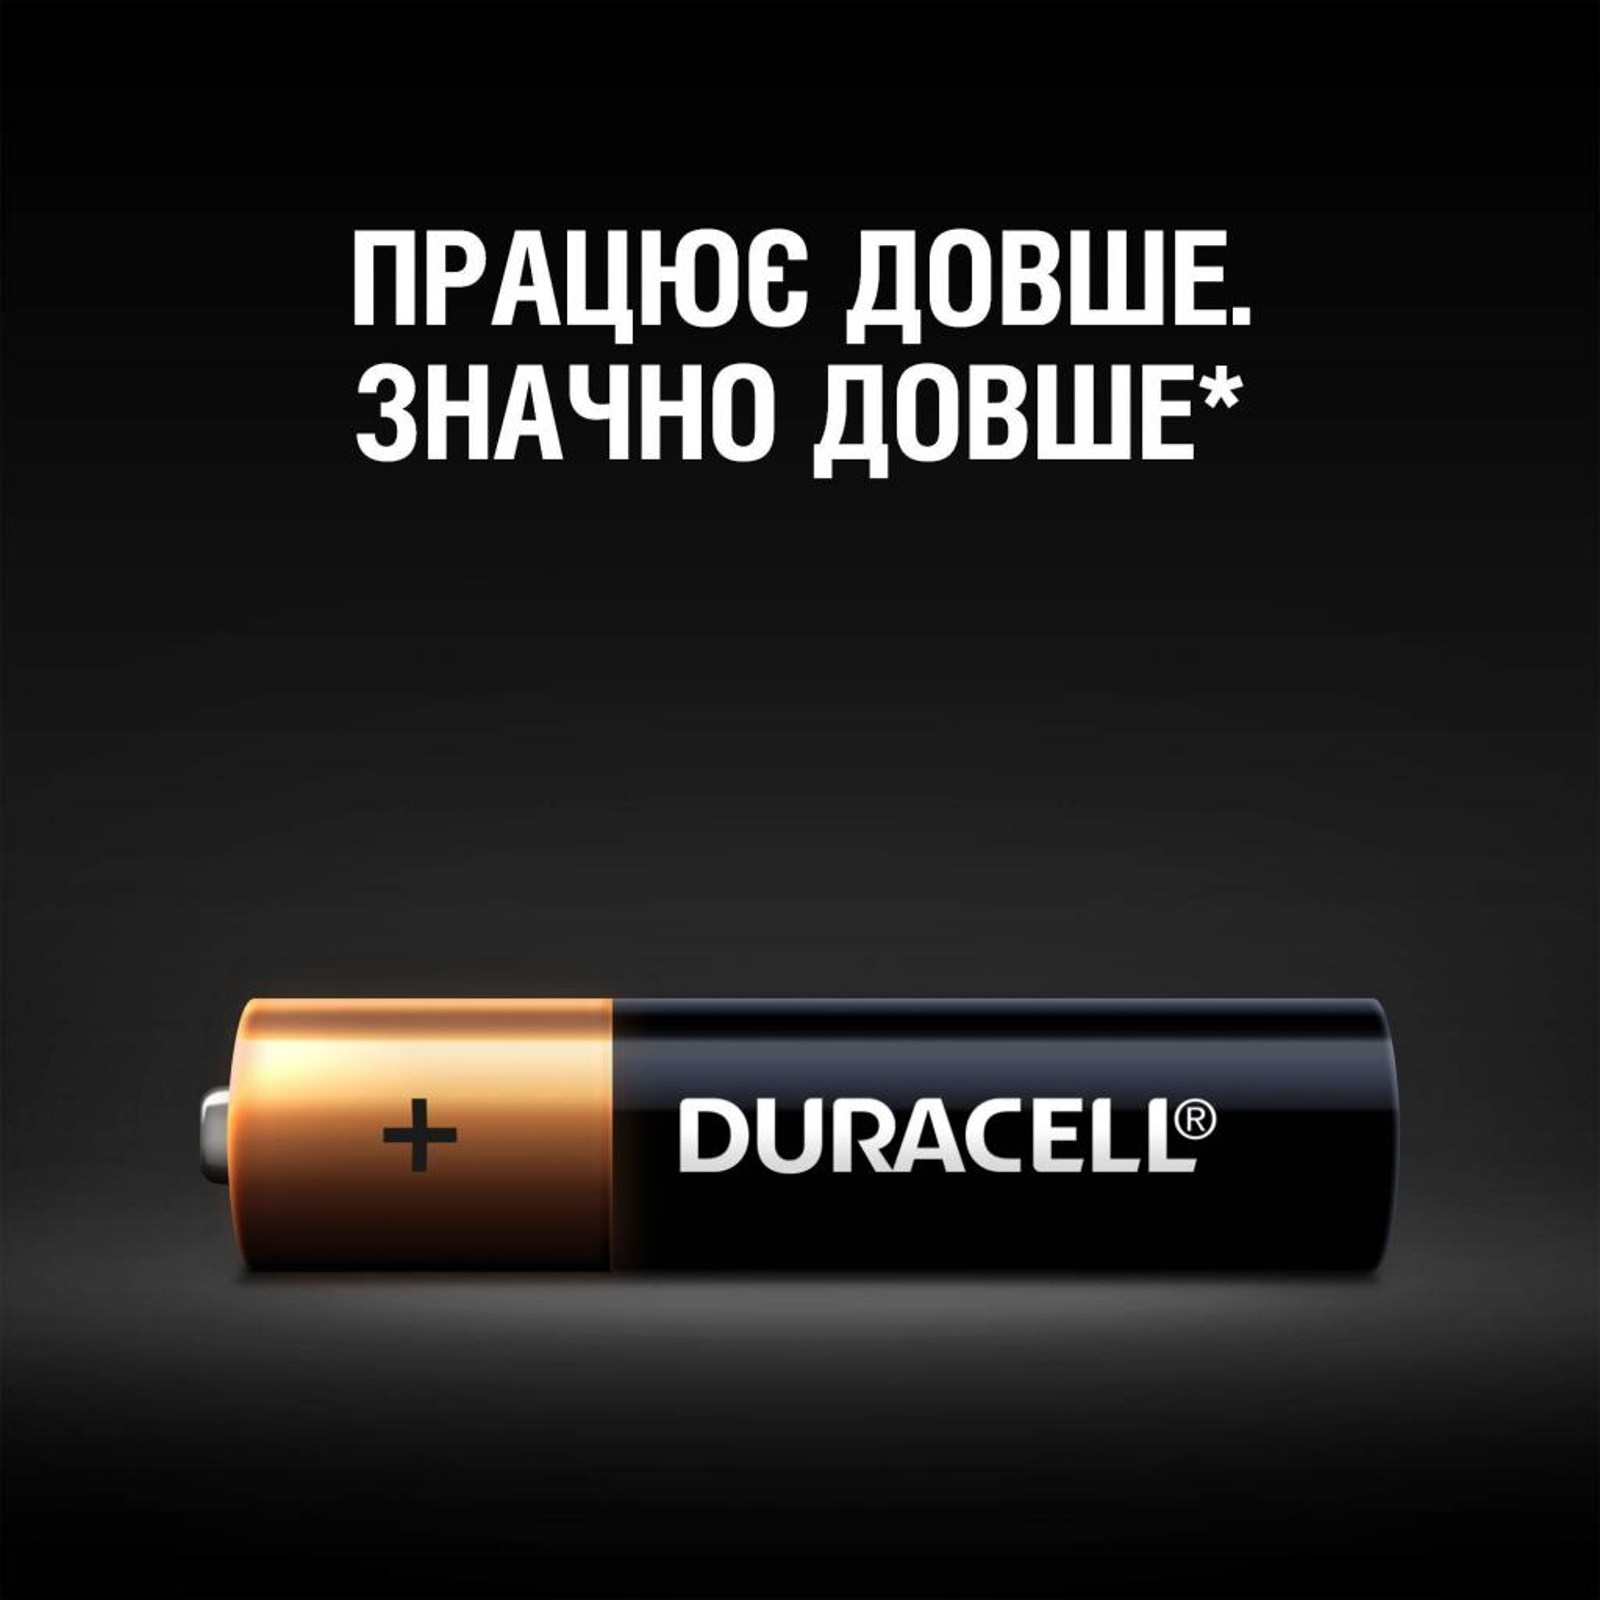 Батарейка Duracell AAA MN2400 LR03 * 12 (5000394109254 / 81545432) изображение 3